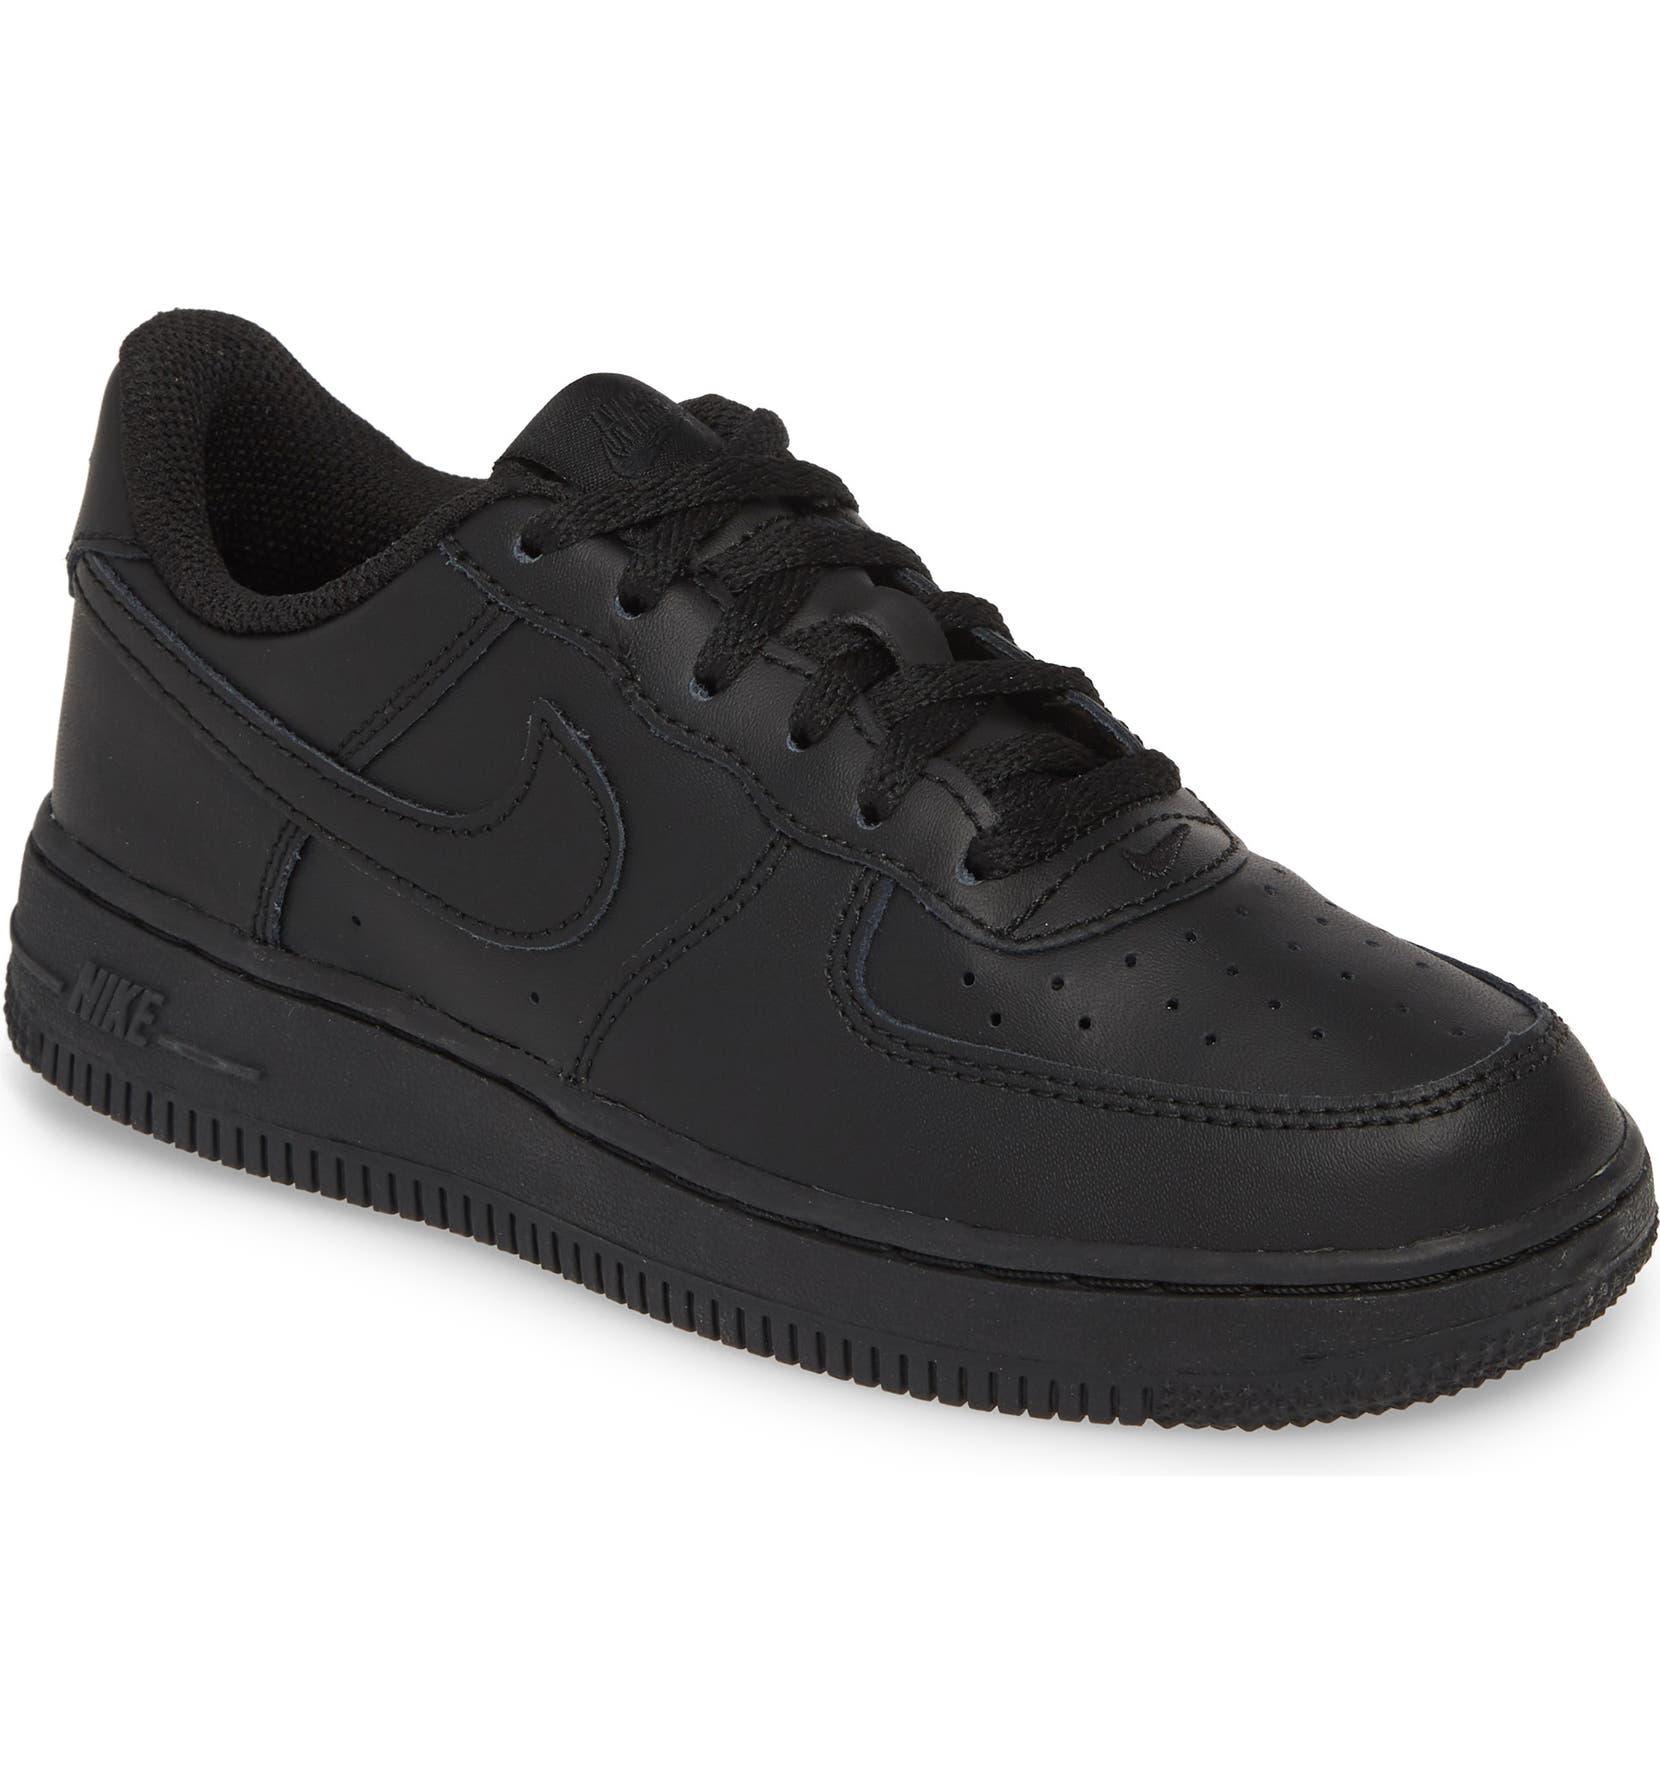 13bc286728112 Nike Air Force 1 Sneaker (Toddler & Little Kid) | Nordstrom